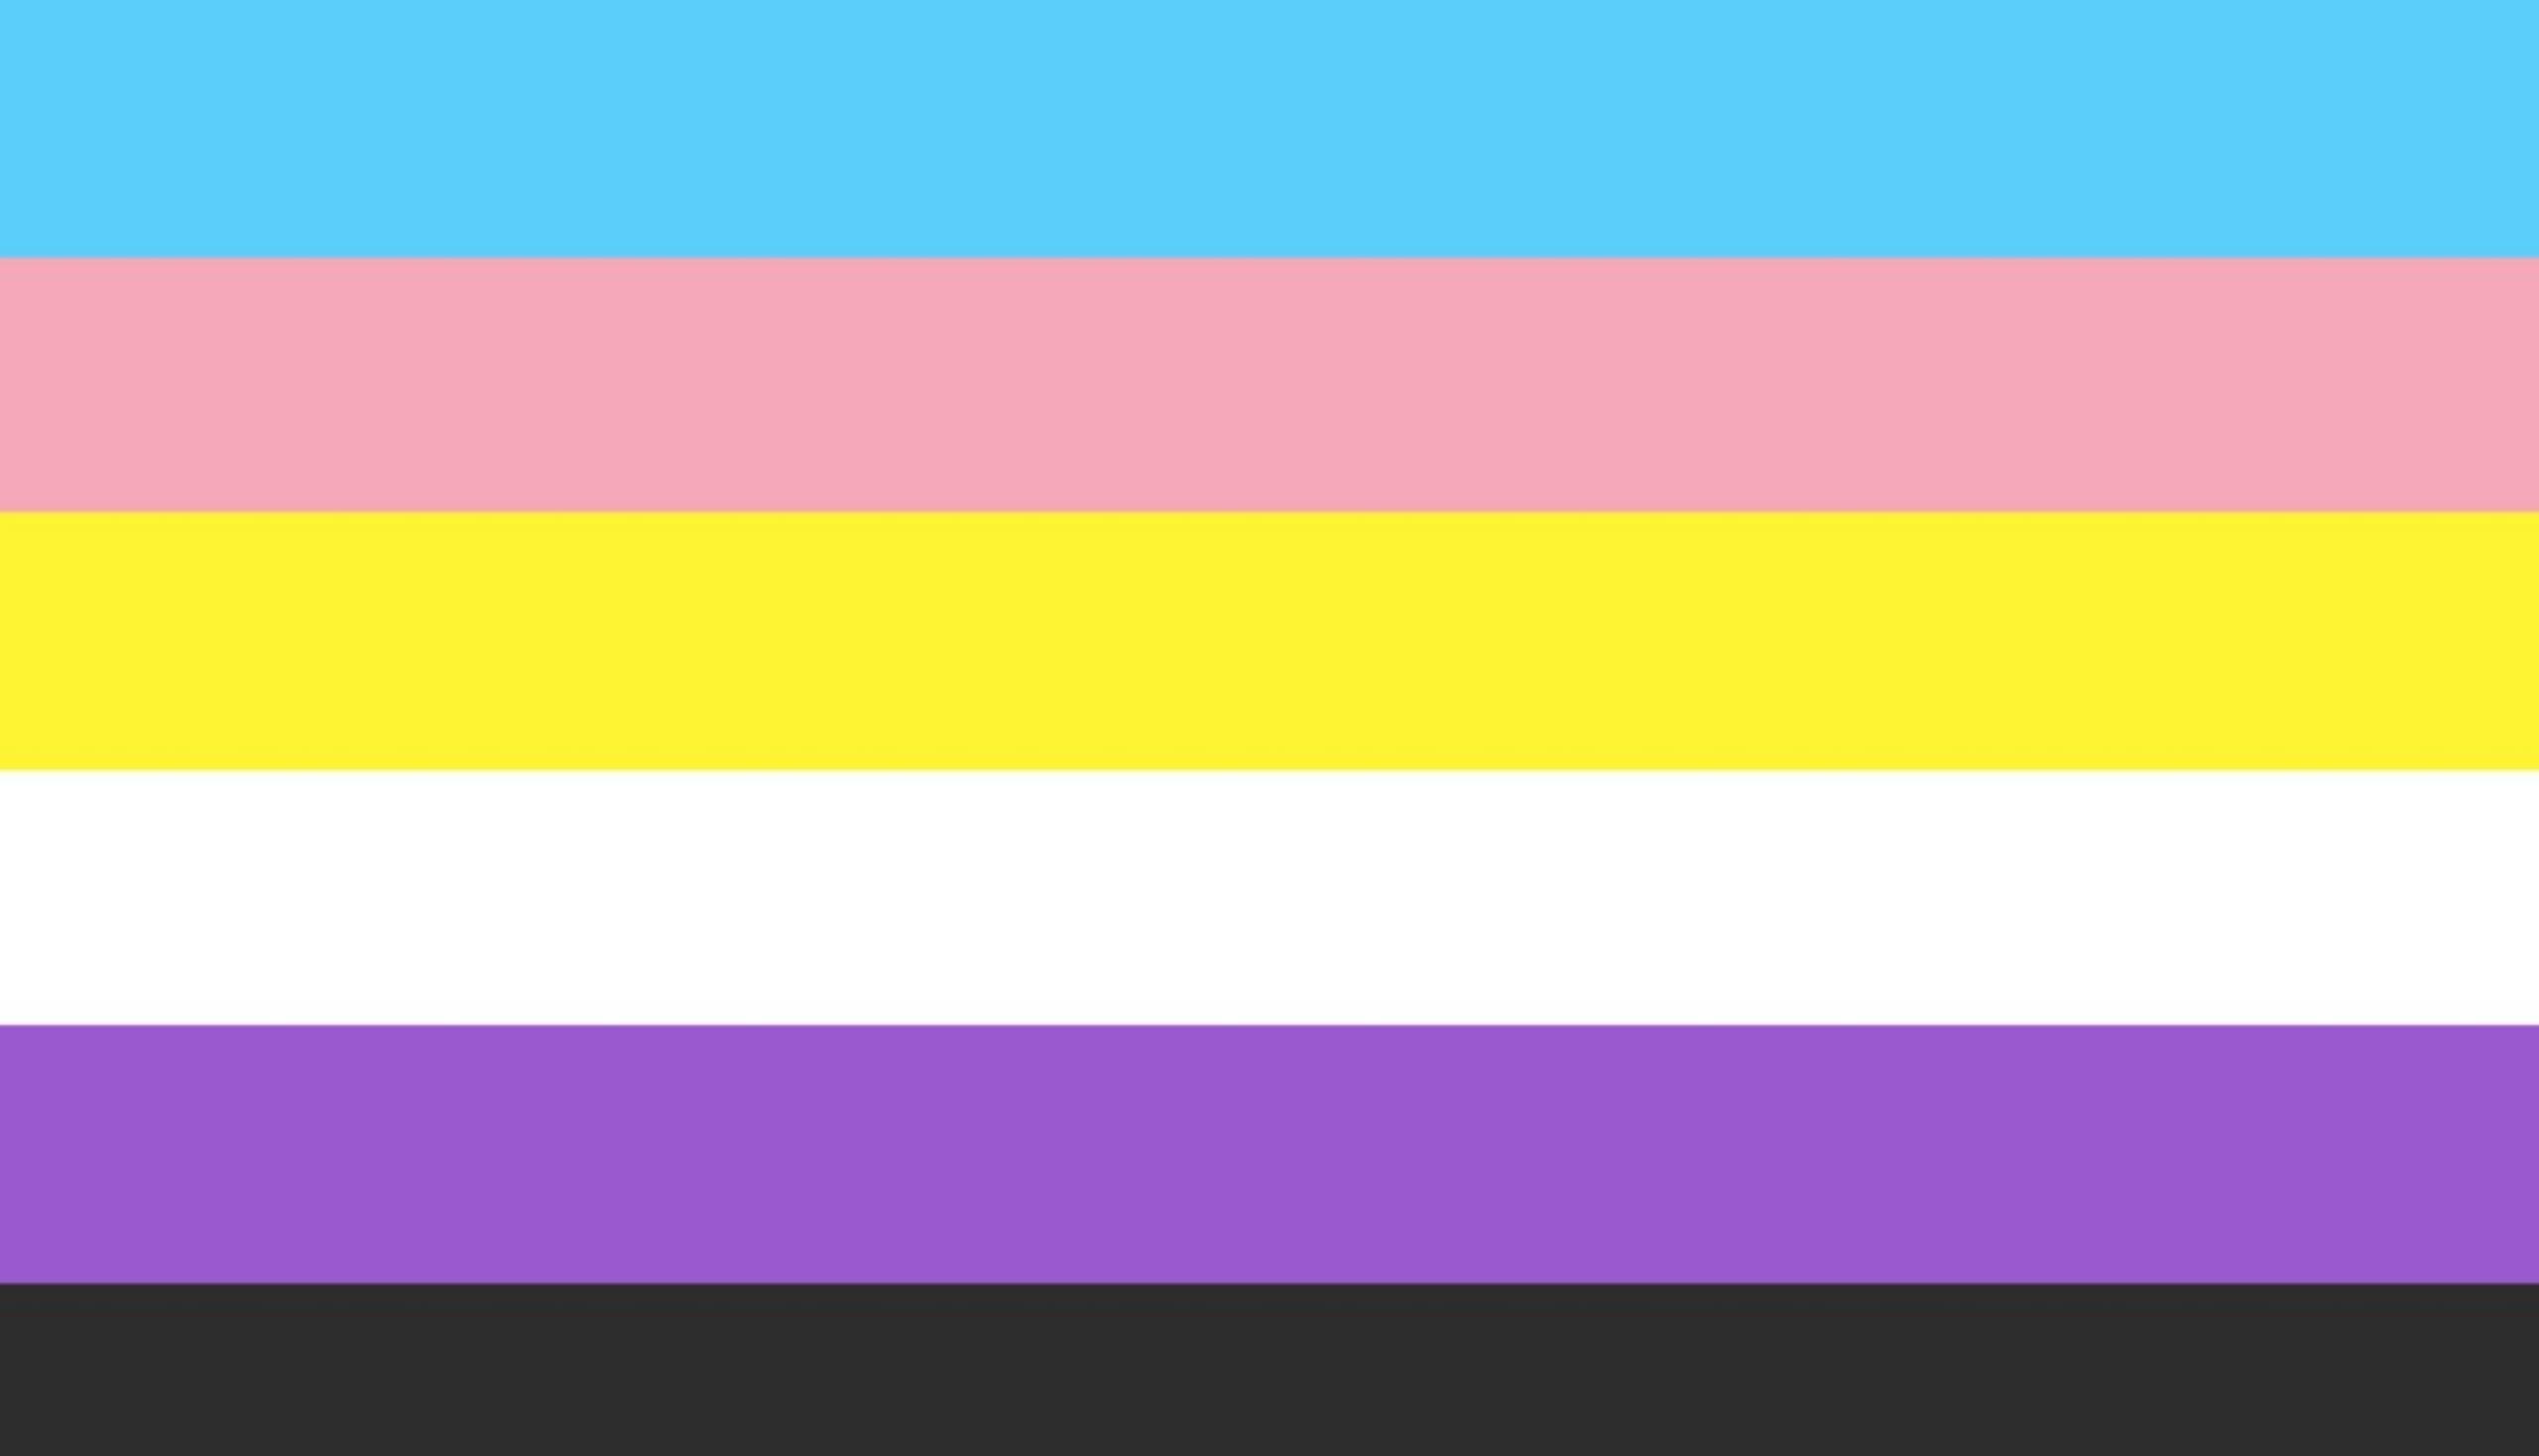 Trans and non-binary flag v2